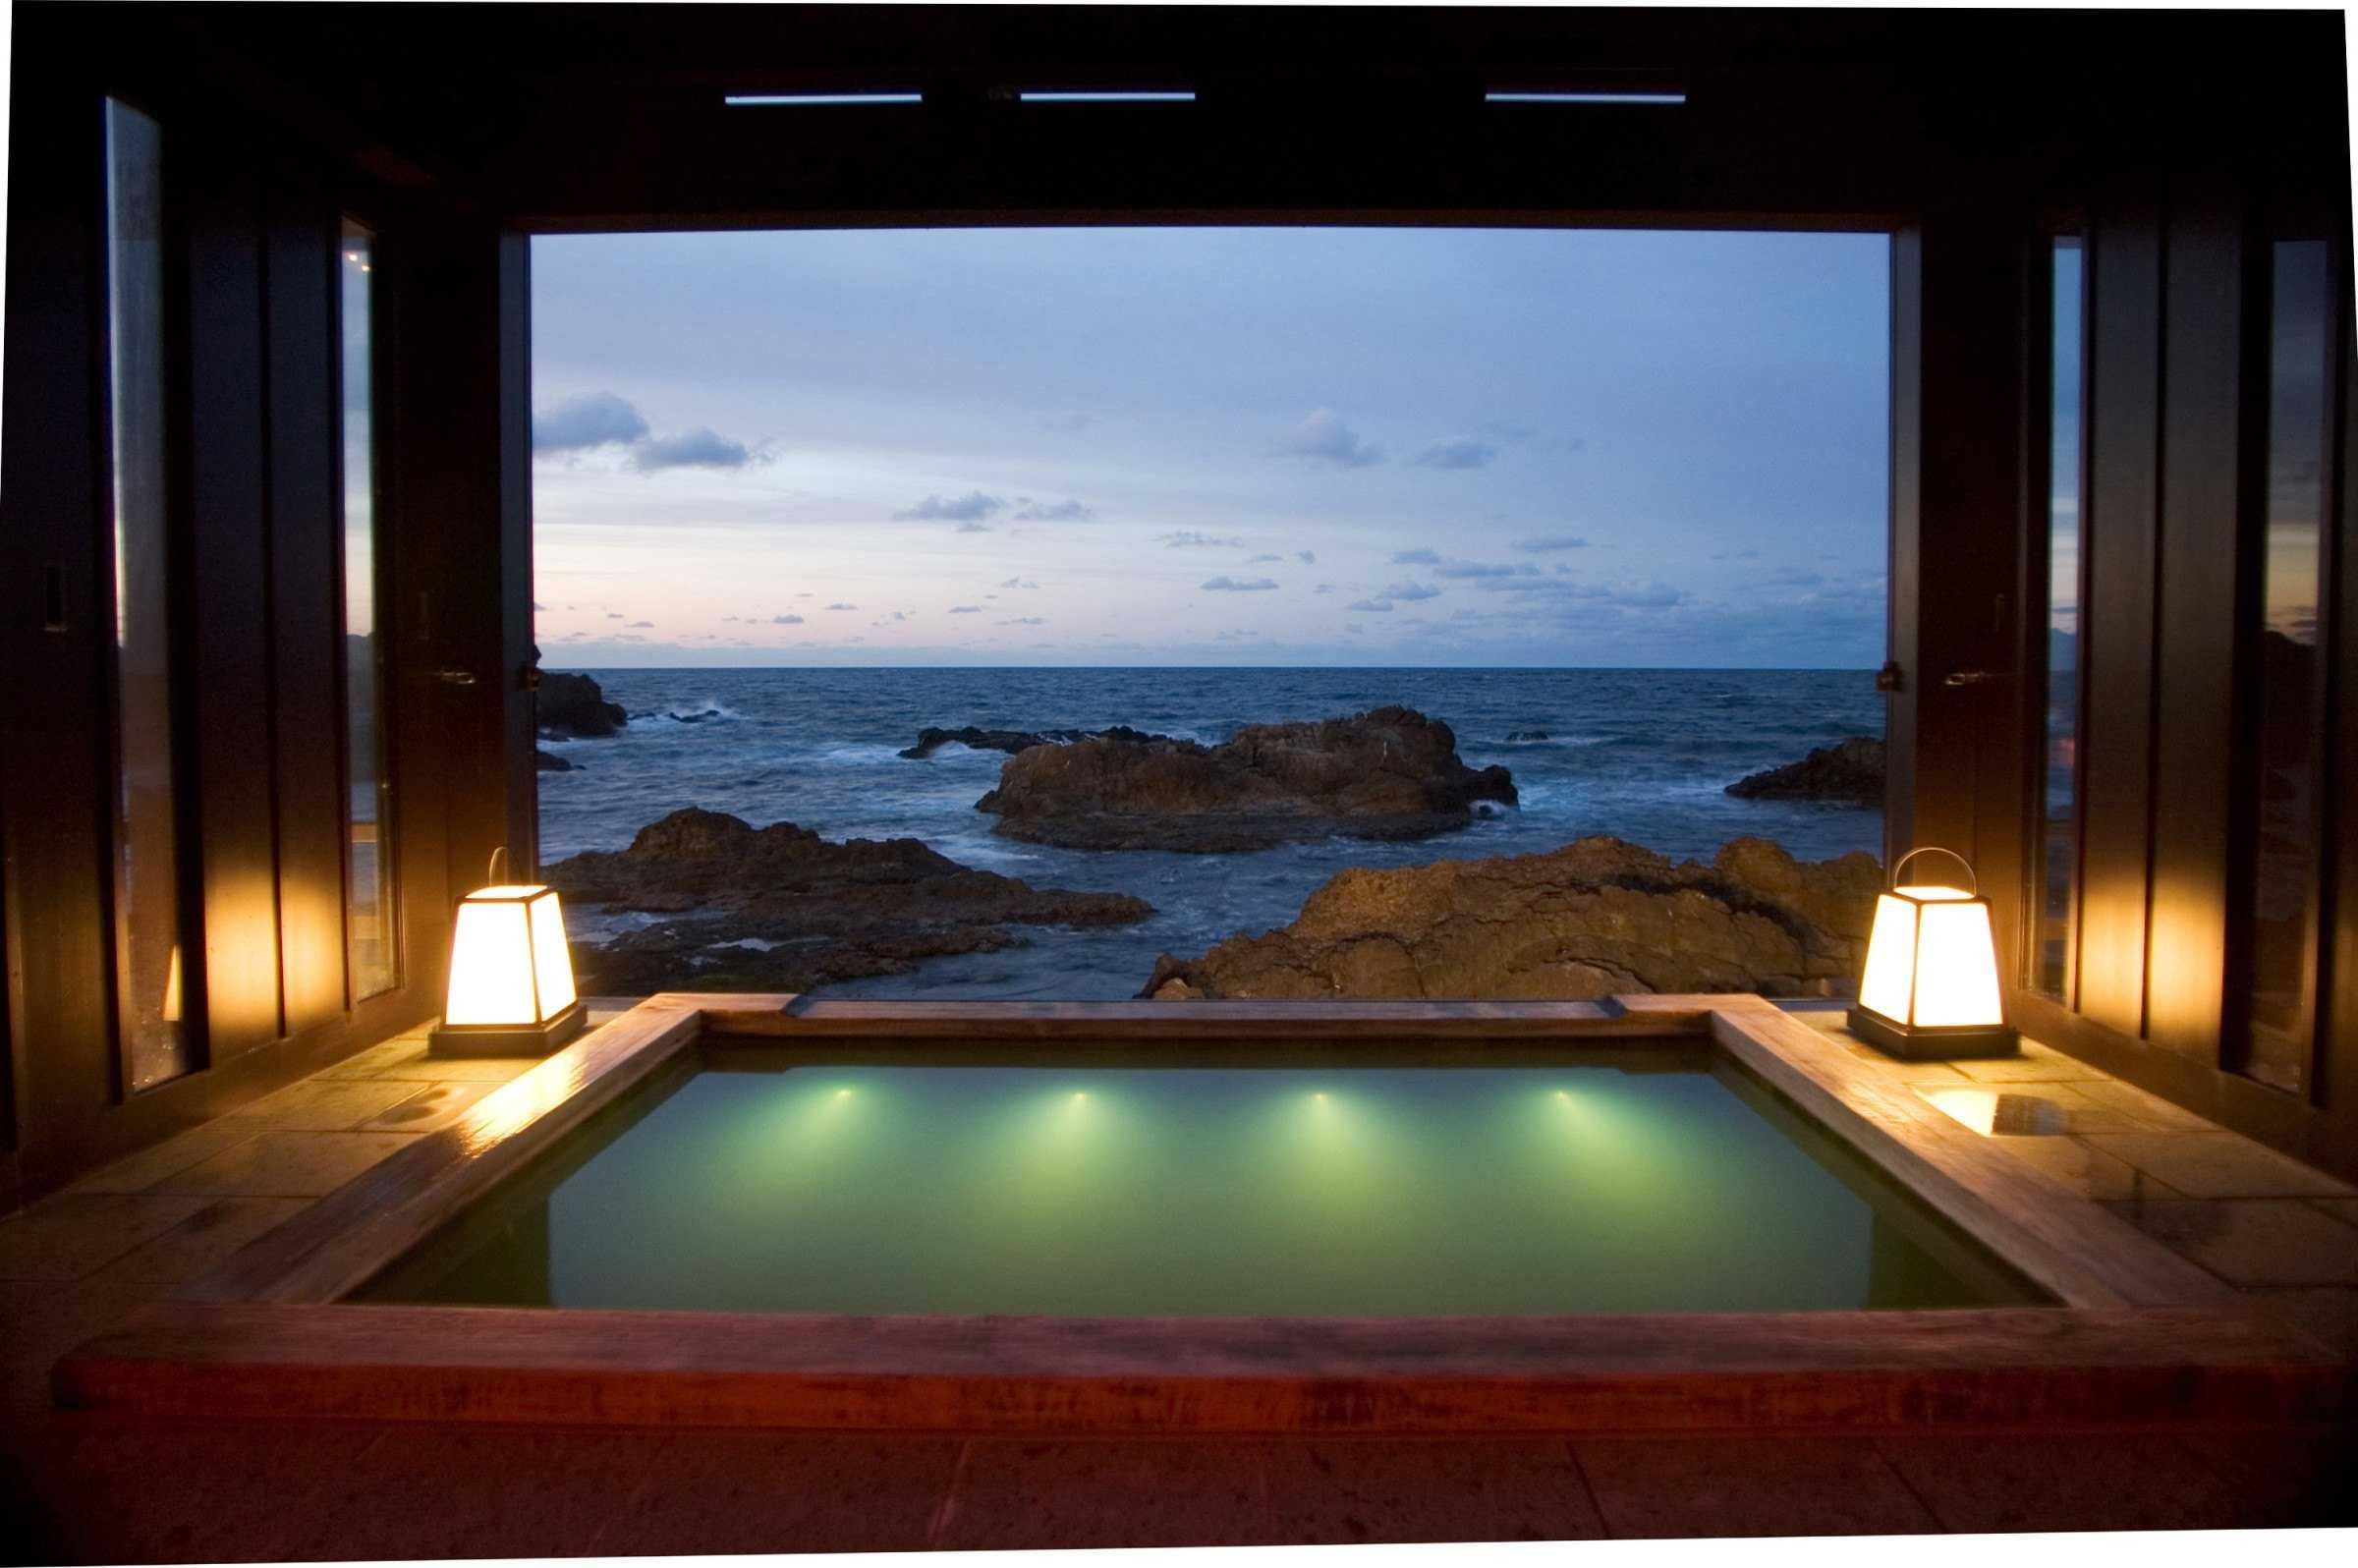 6 reasons to stay at a ryokan in Japan - 101 Holidays blog